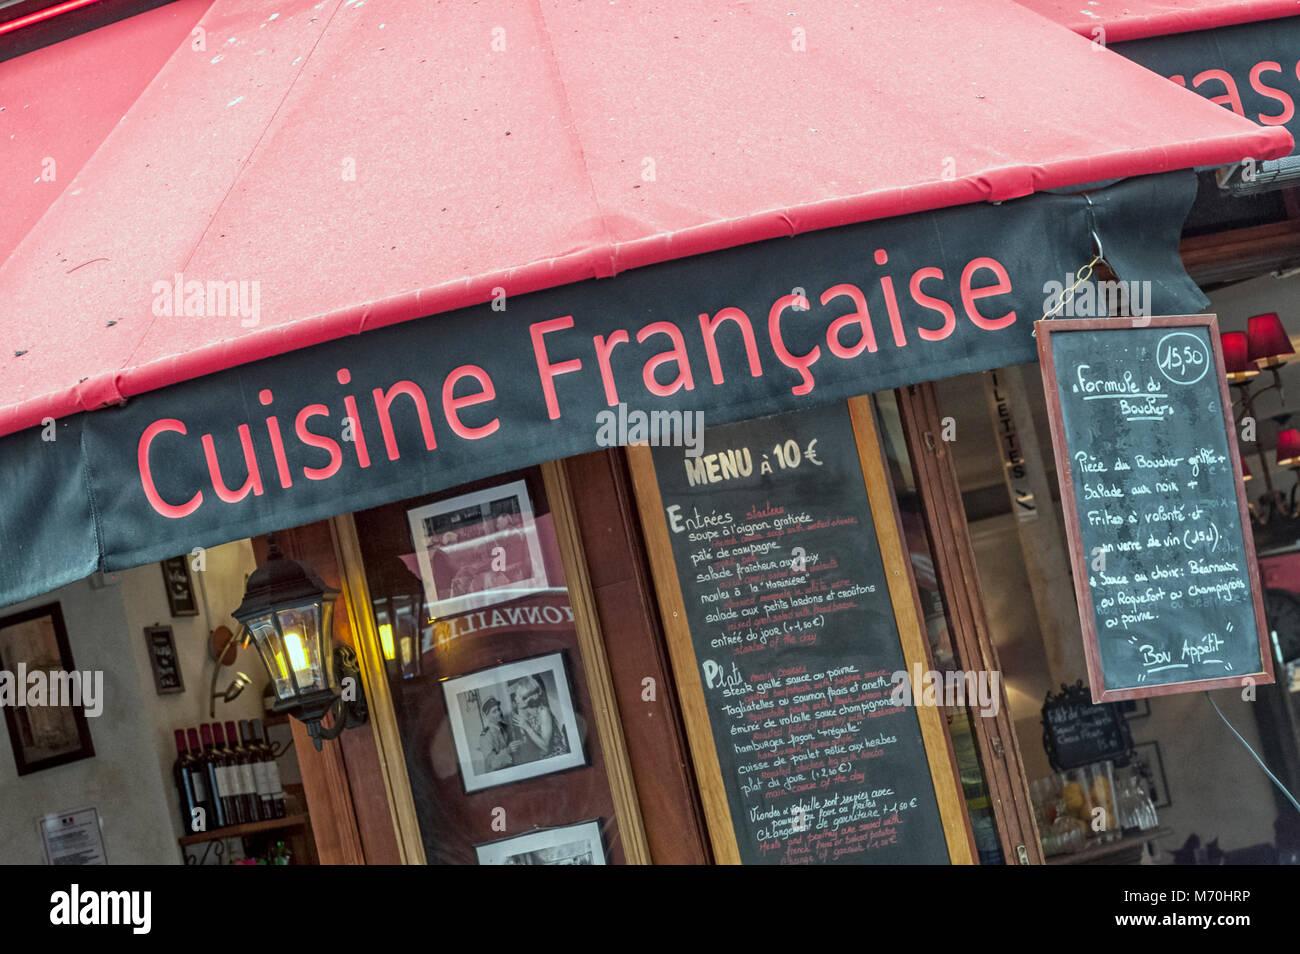 Paris France Restaurant Advertising Cuisine Francaise In